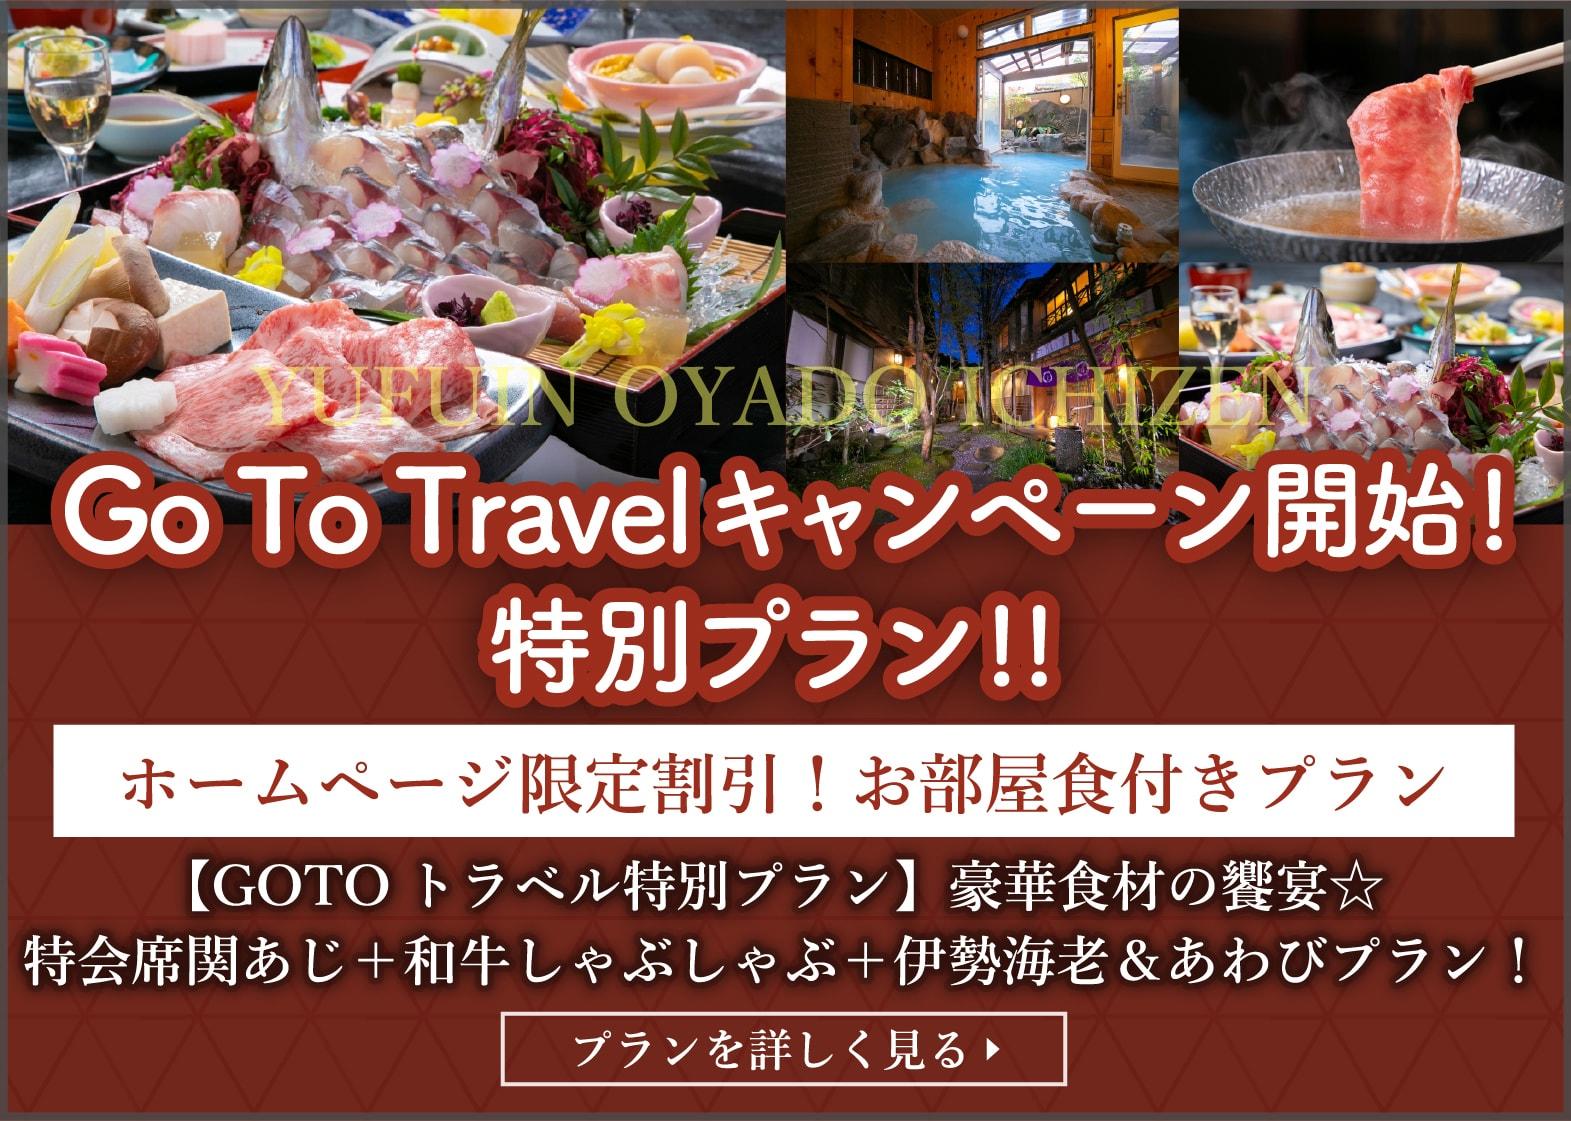 Go To Travel キャンペーン開始!特別プラン!